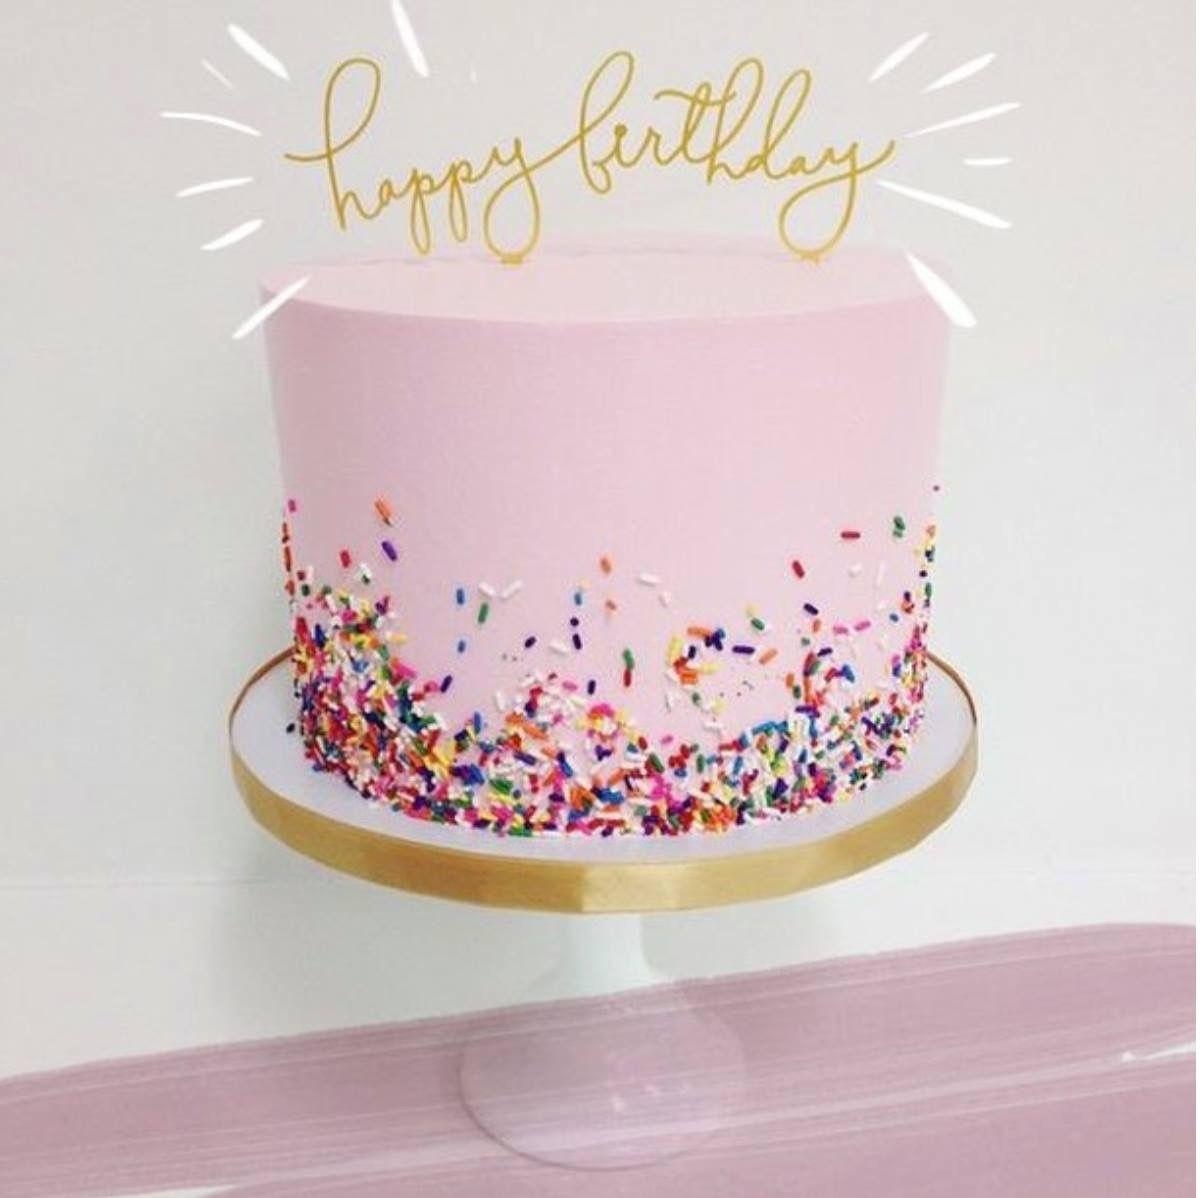 Pin by Espacio Craft on Sweet Party Pinterest Cake Birthdays